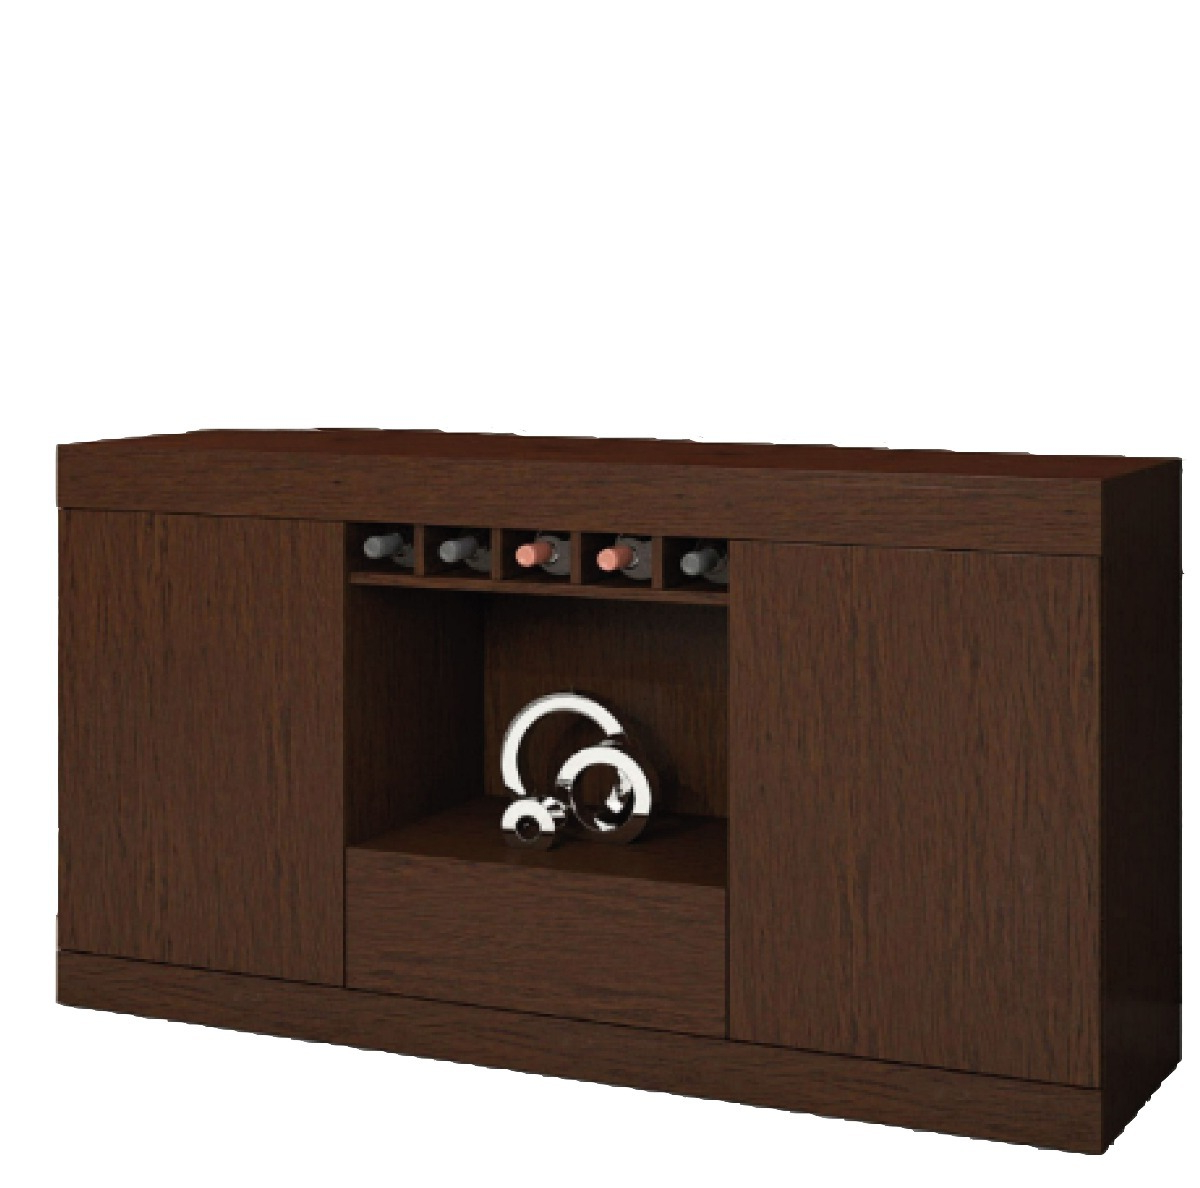 Mueble Buffet Q0d4 Aparador Mueble Buffet Bargueà O Living Fenix Chocolate 3 384 00